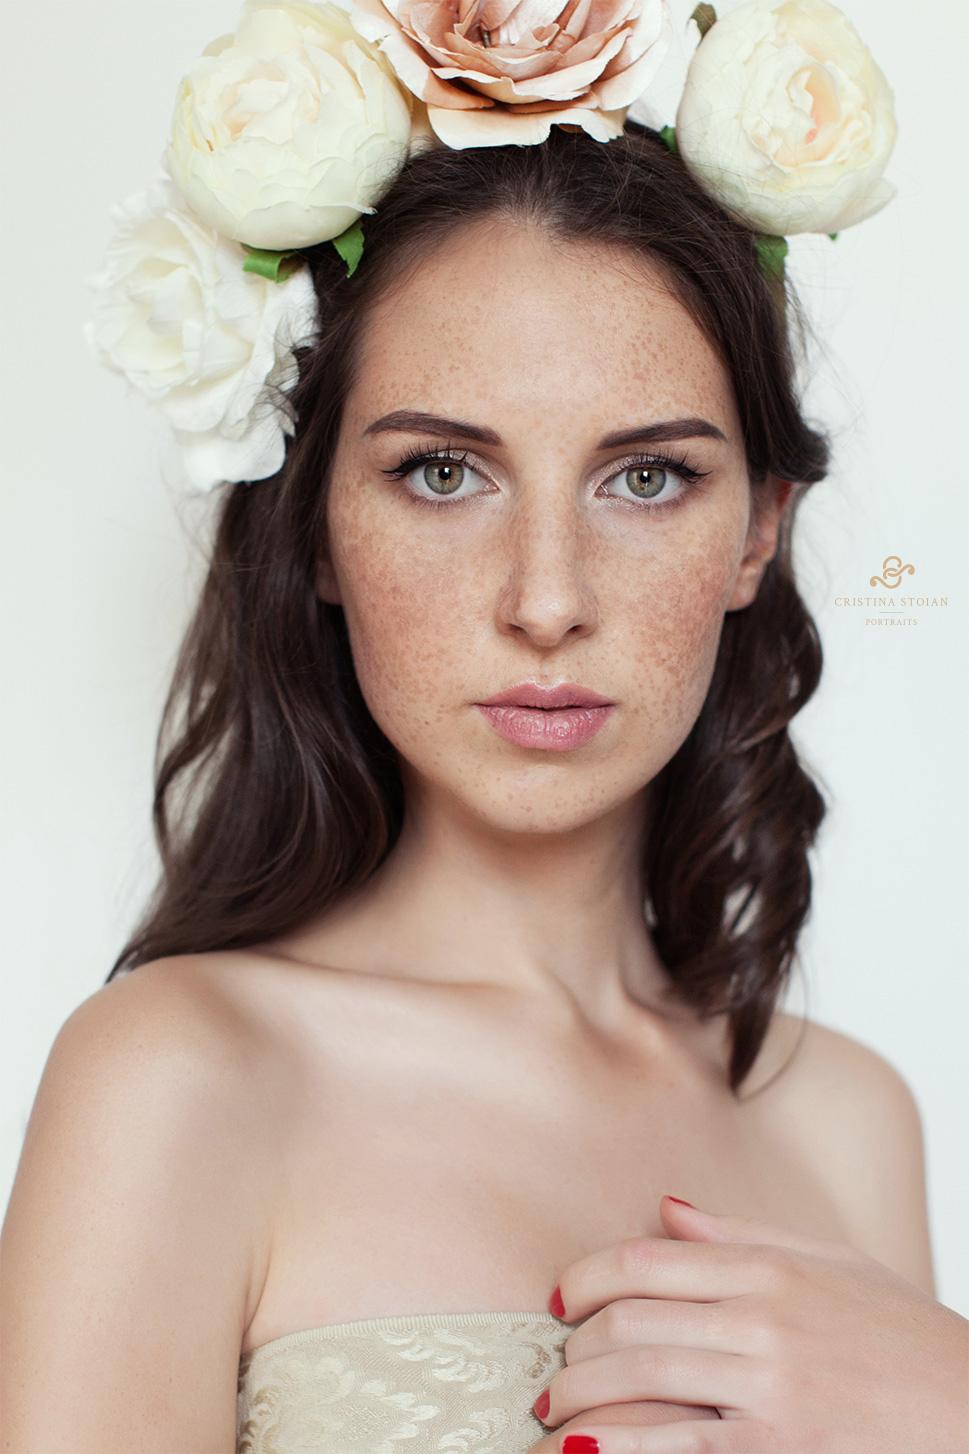 Cristina-Stoian-Portrait-Photographer 22